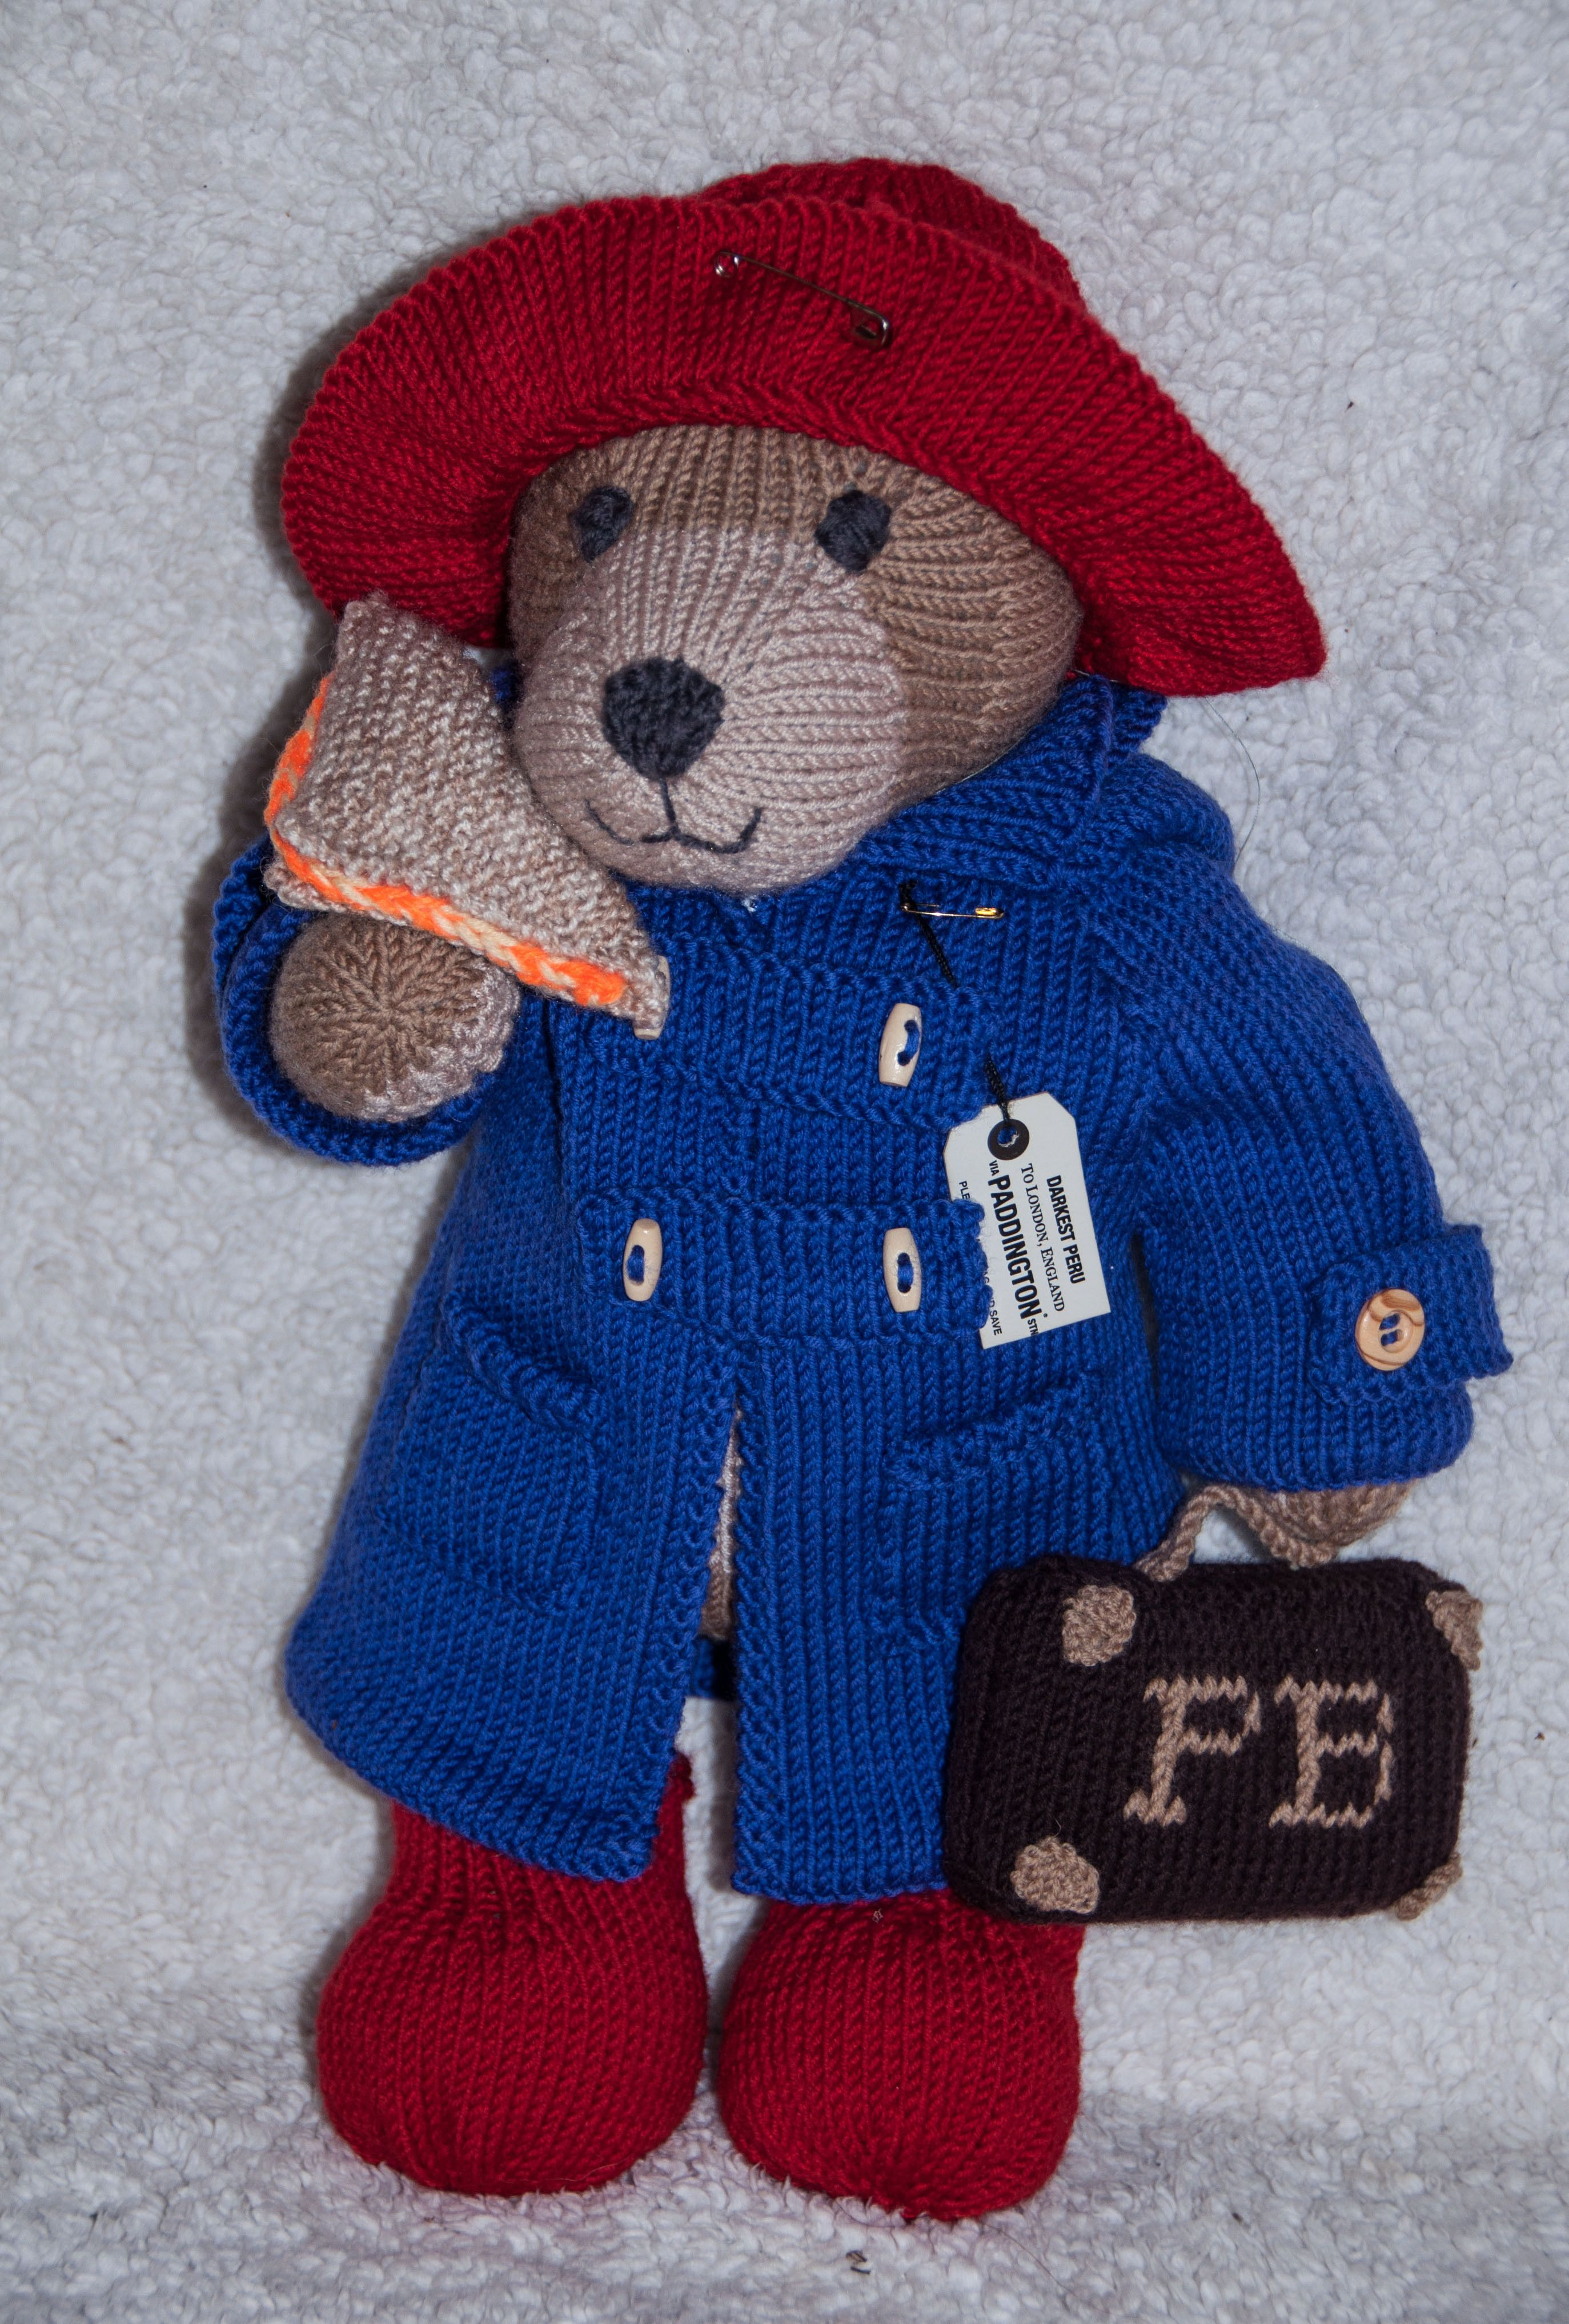 Paddington Bear knitting project by Cheryl M | knìtted toys ...